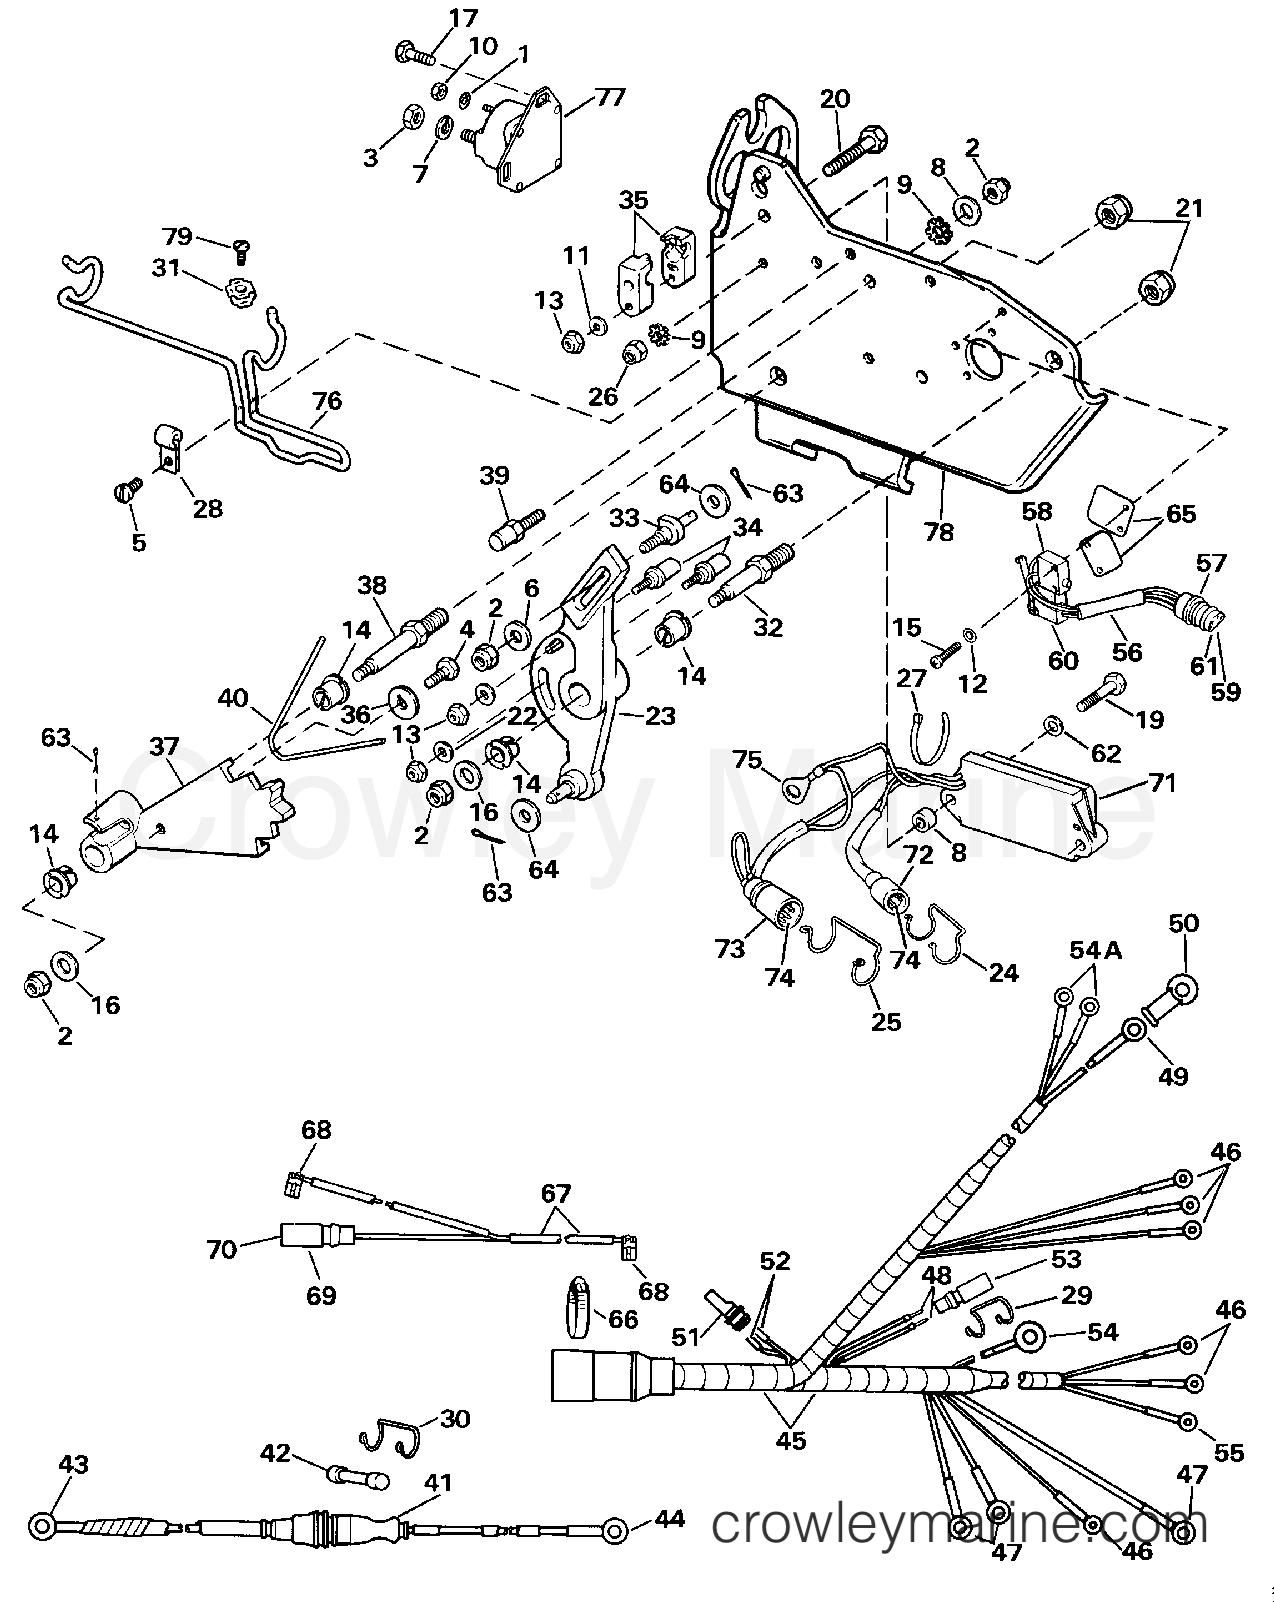 1989 OMC Stern Drive 5.7 - 574AMLMED - WIRE HARNESS, BRACKET & SOLENOID  section